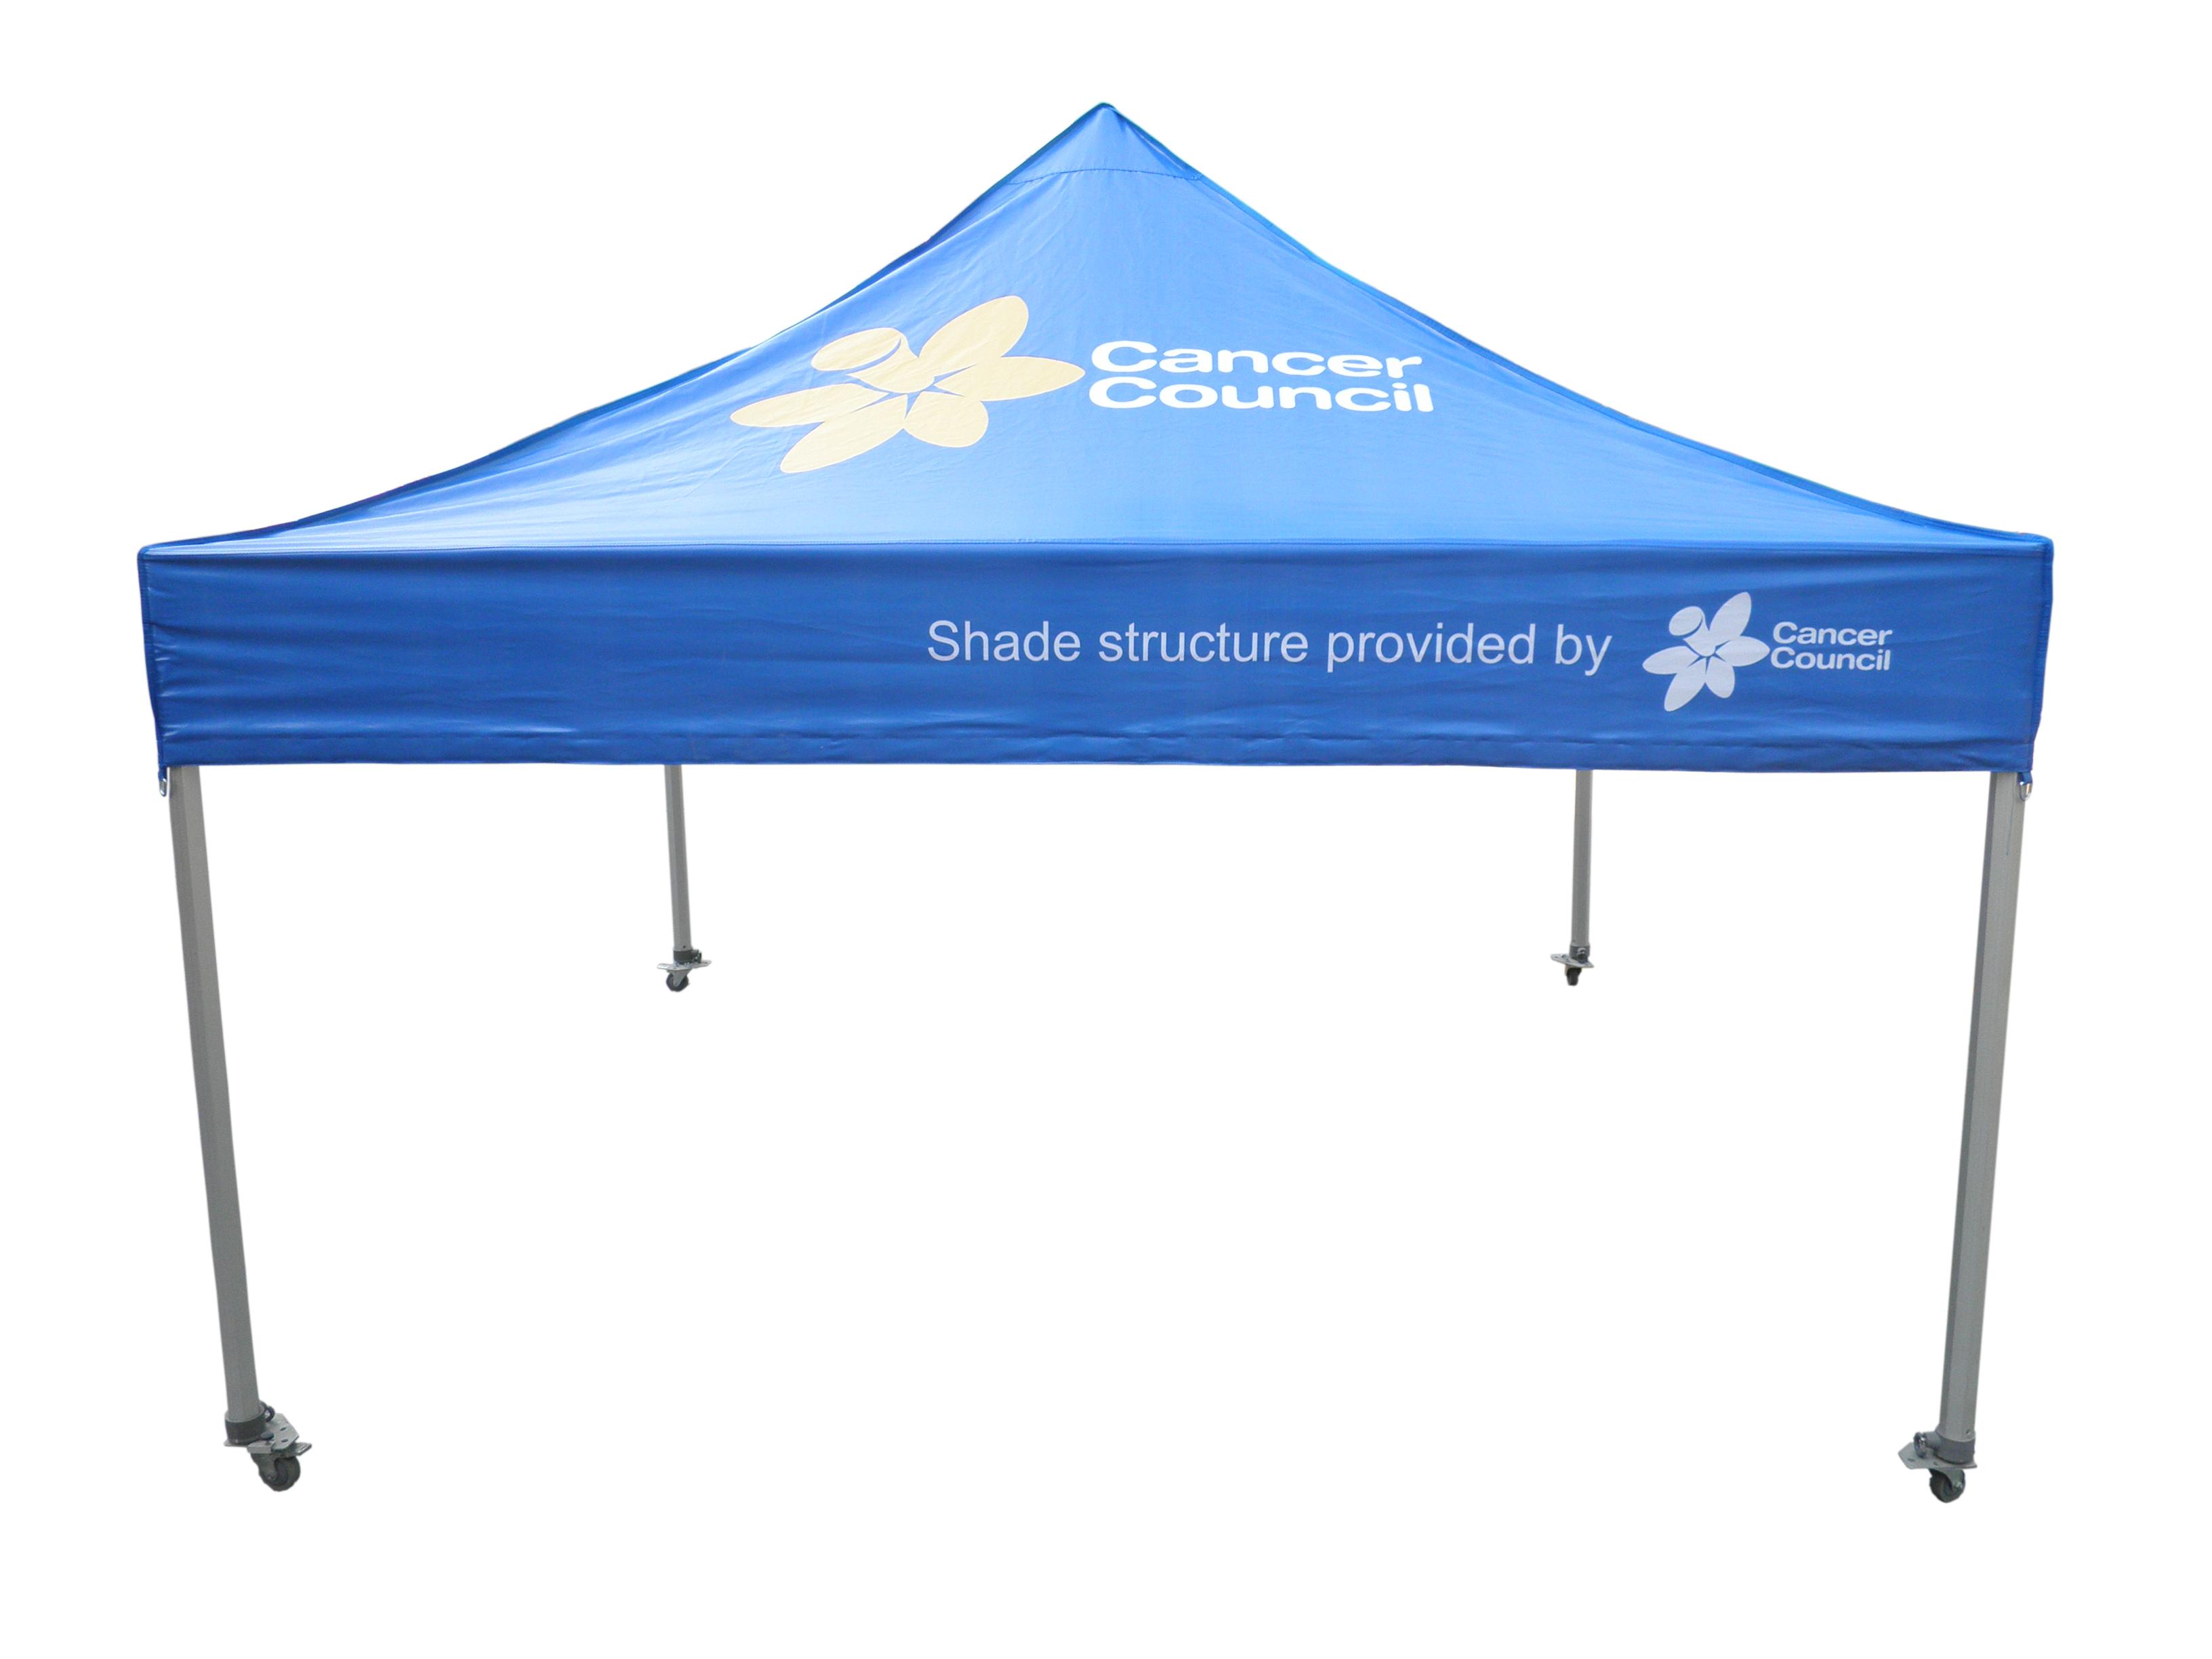 3m x 3m Tents